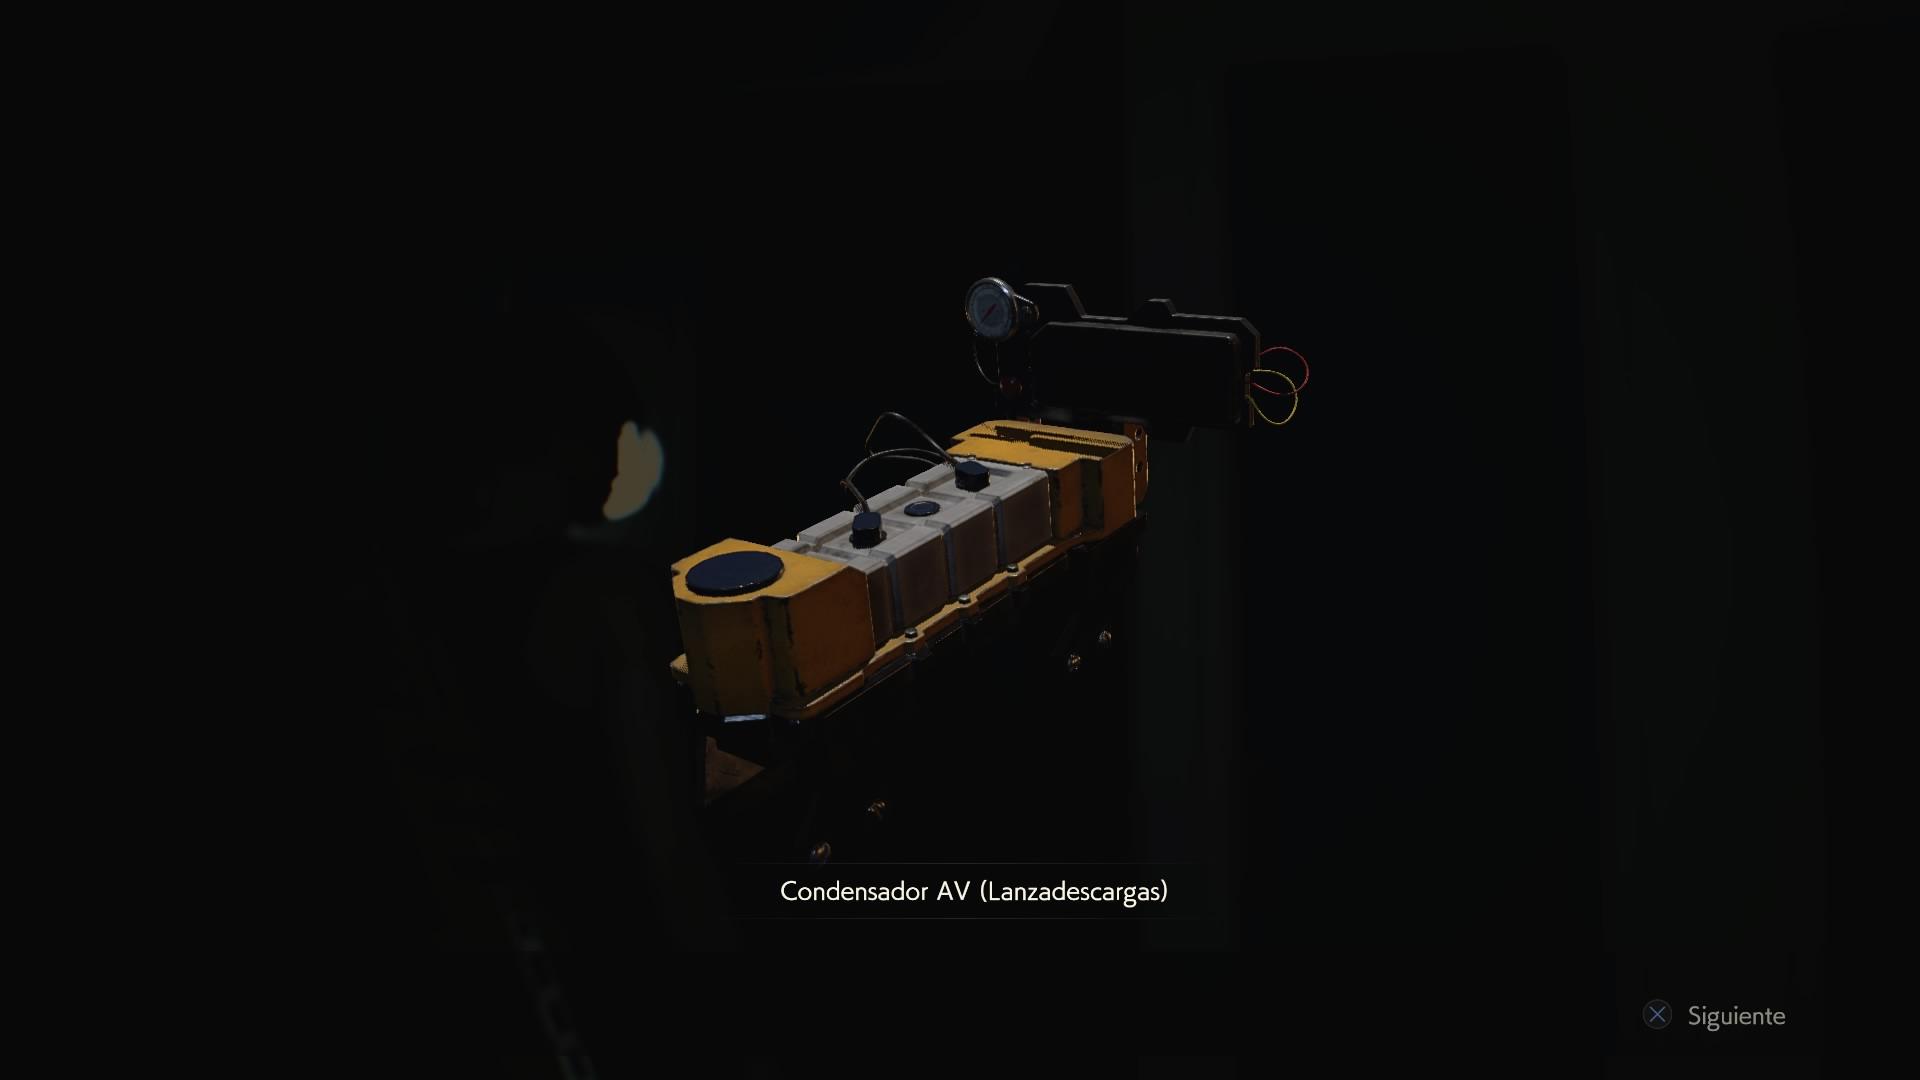 Condensador AV (Lanzadescargas)